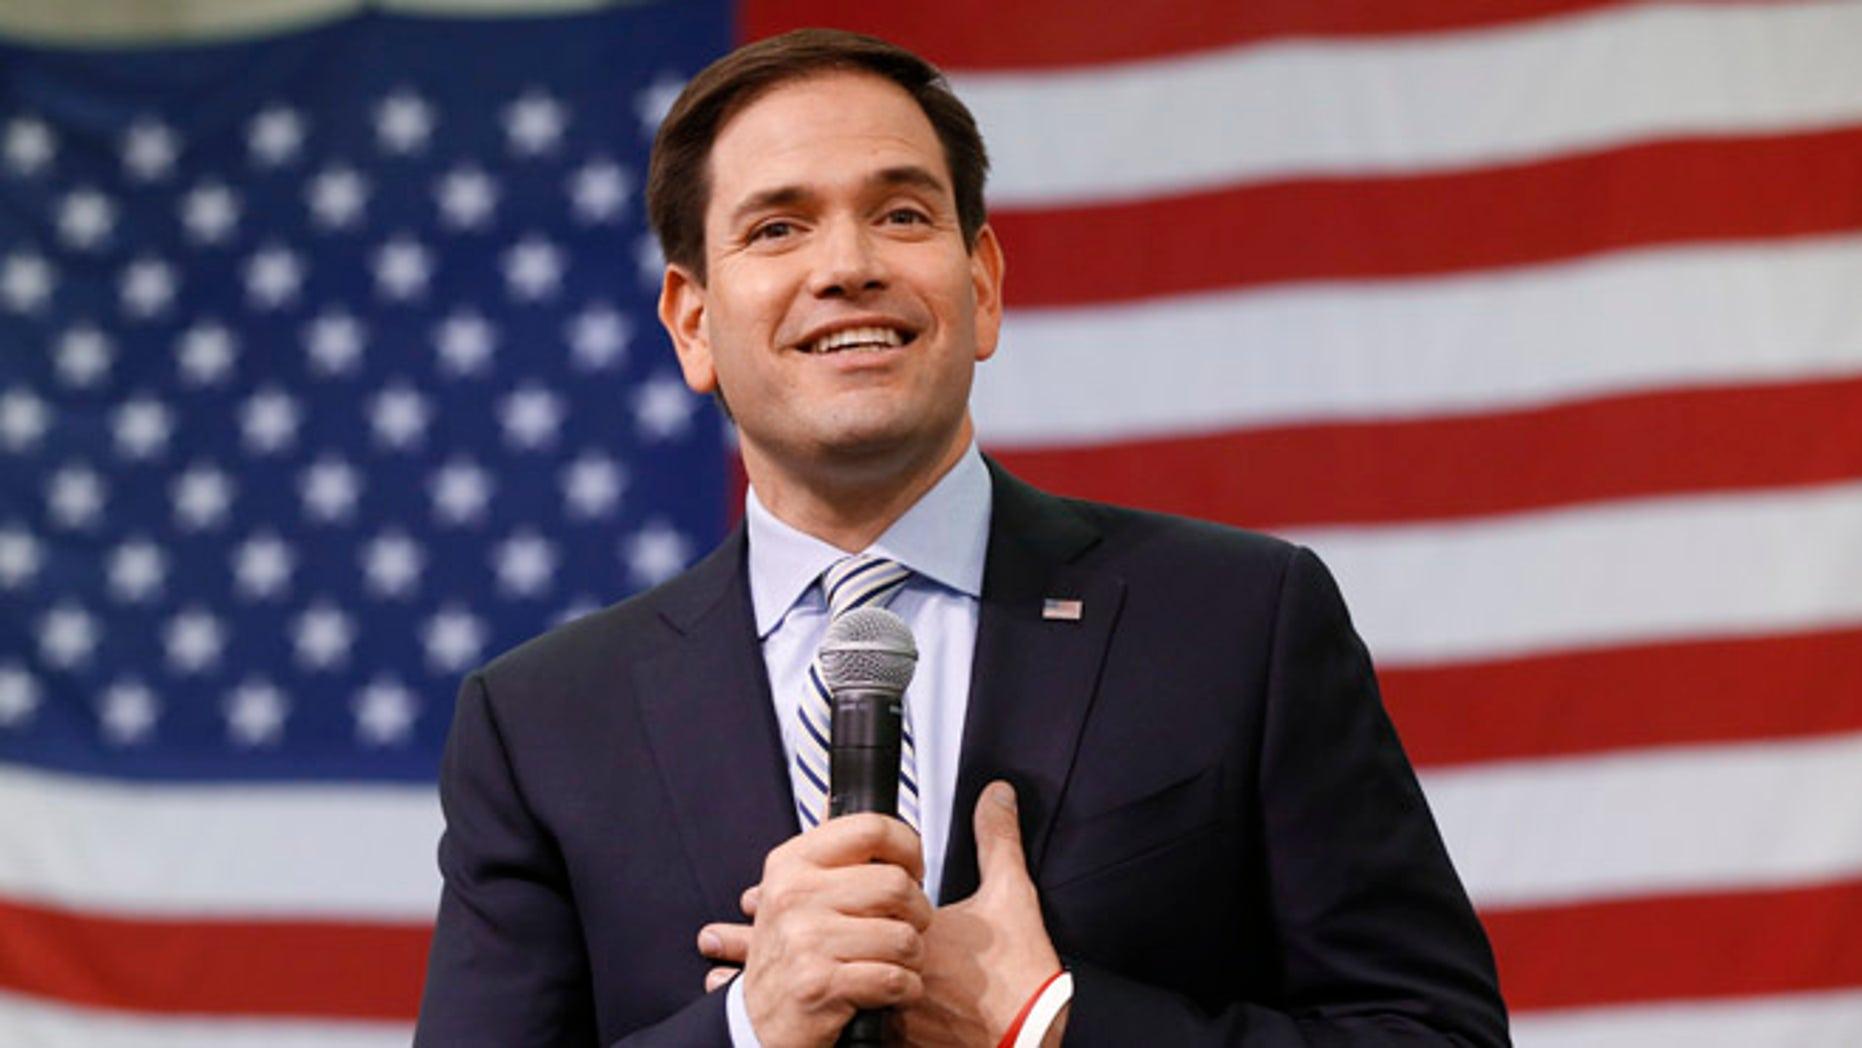 Republican presidential candidate, Sen. Marco Rubio, R-Fla., speaks at a campaign rally in Idaho Falls, Idaho, Sunday, March 6, 2016. (AP Photo/Paul Sancya)